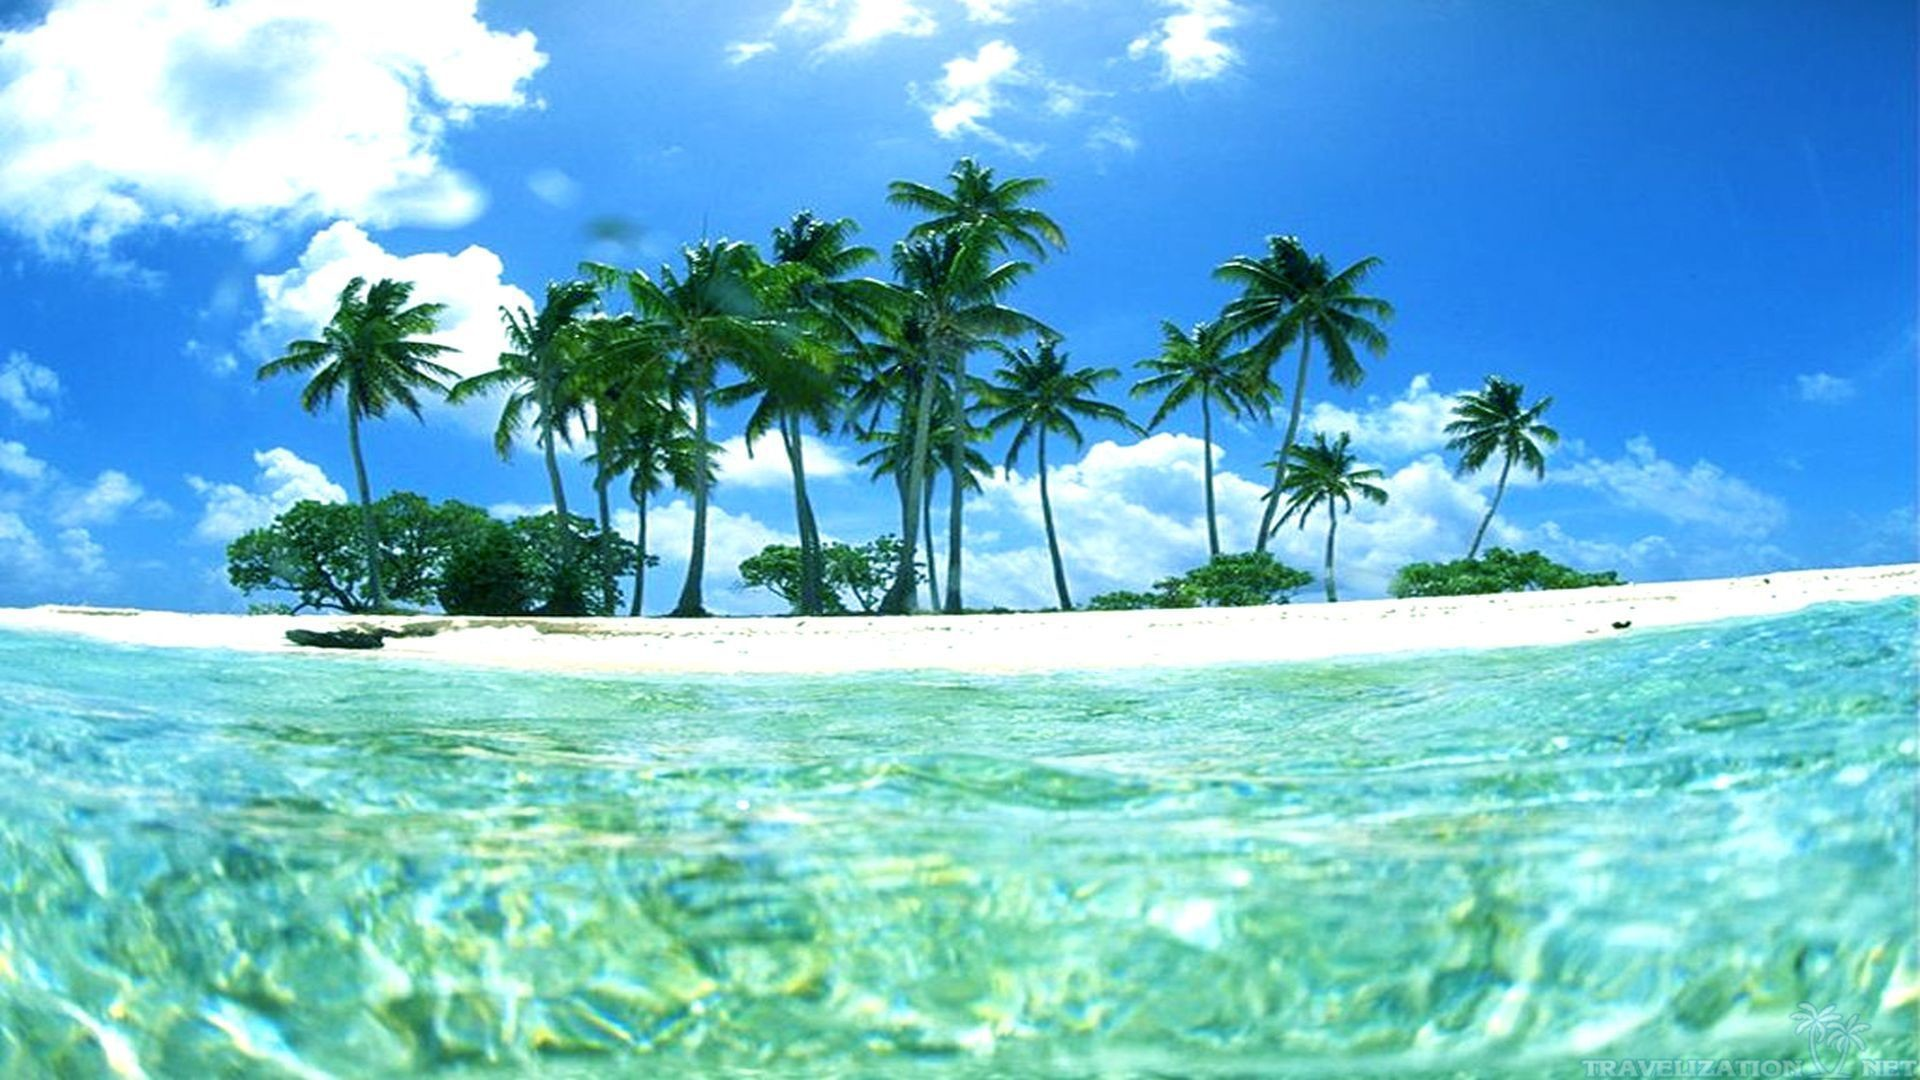 Tropical Island Desktop Backgrounds 1920x1080